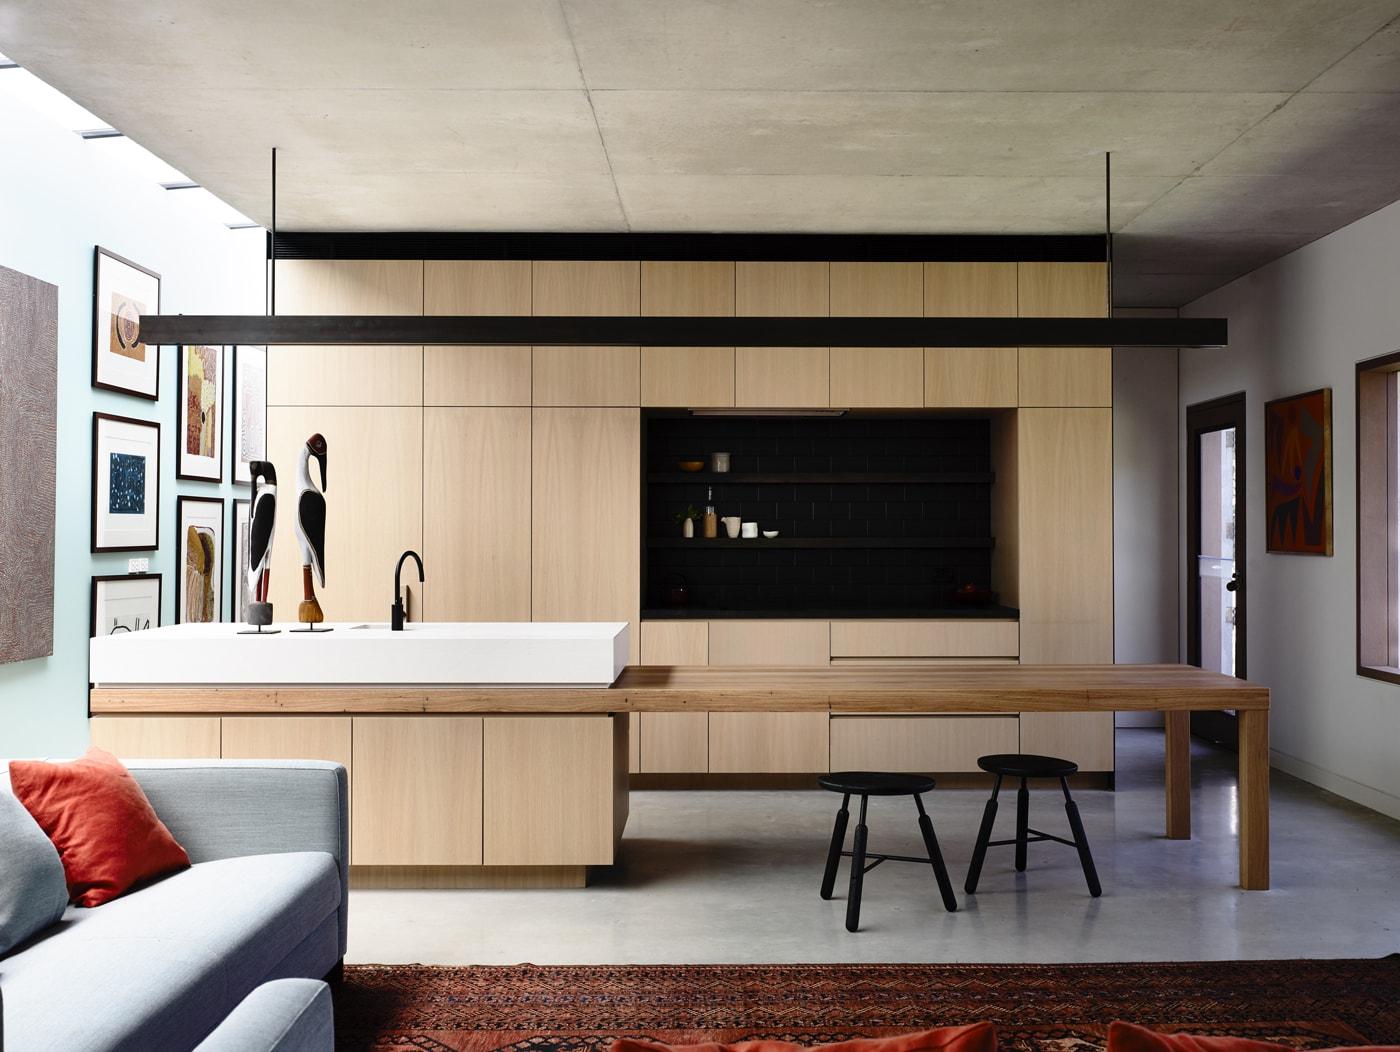 In-Situ House - Rob Kennon Architects - Toorak, VIC, Australia - Image 17-min